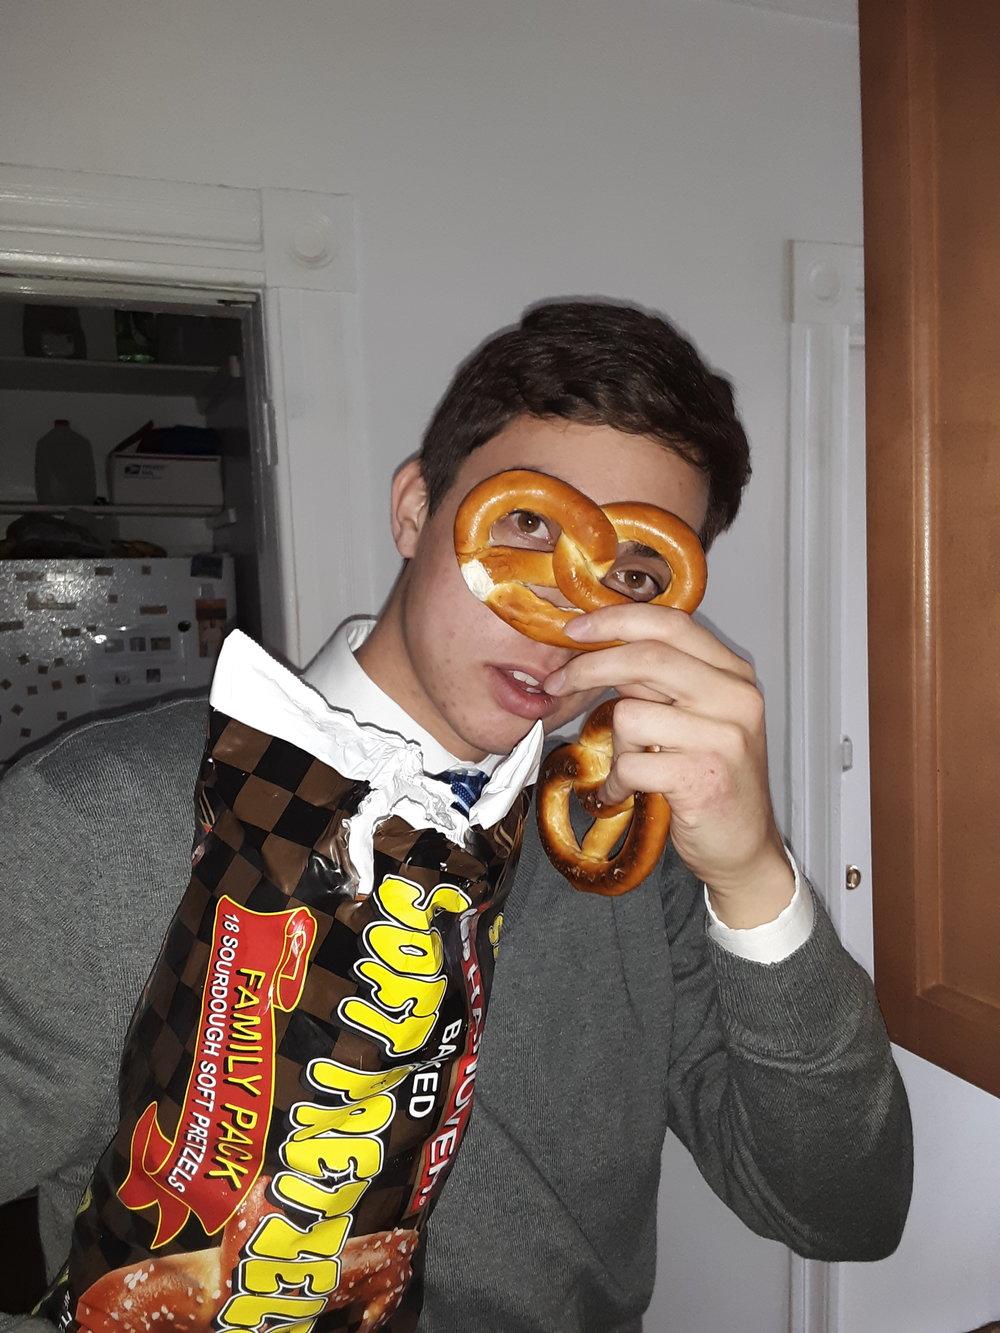 I'm the pretzel master.